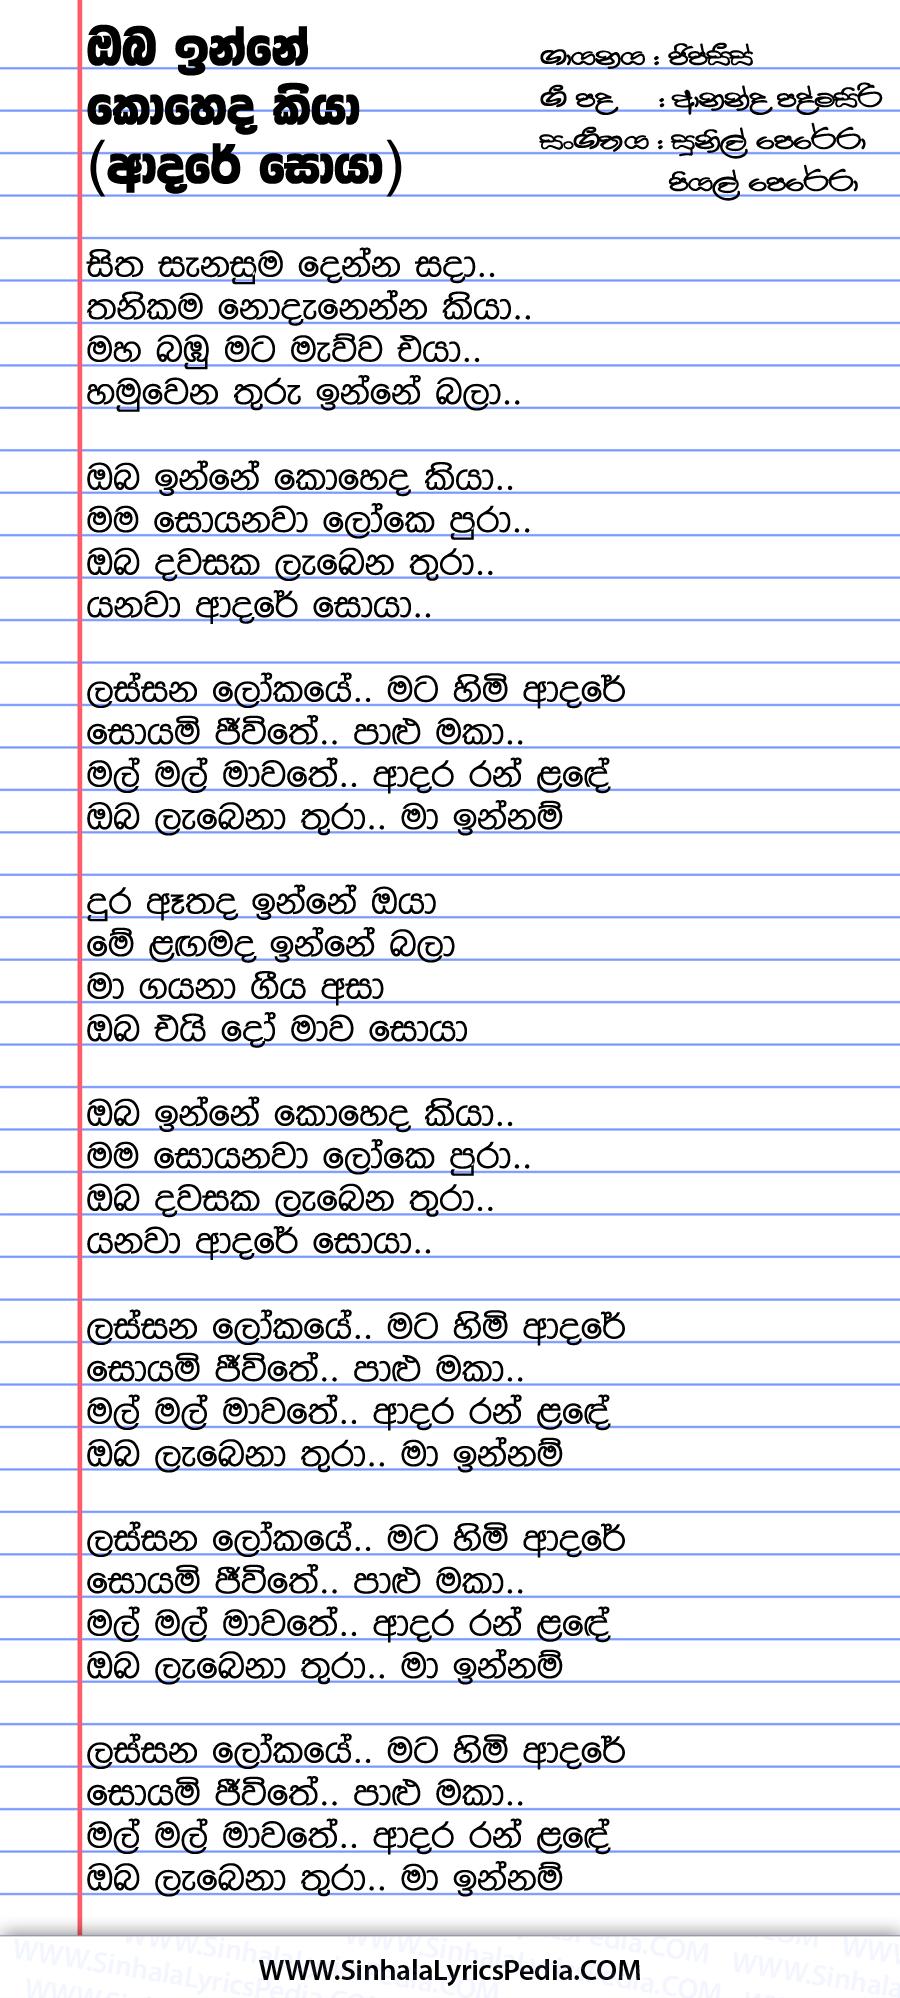 Sitha Sanasuma Denna Sada (Adare Soya) Song Lyrics